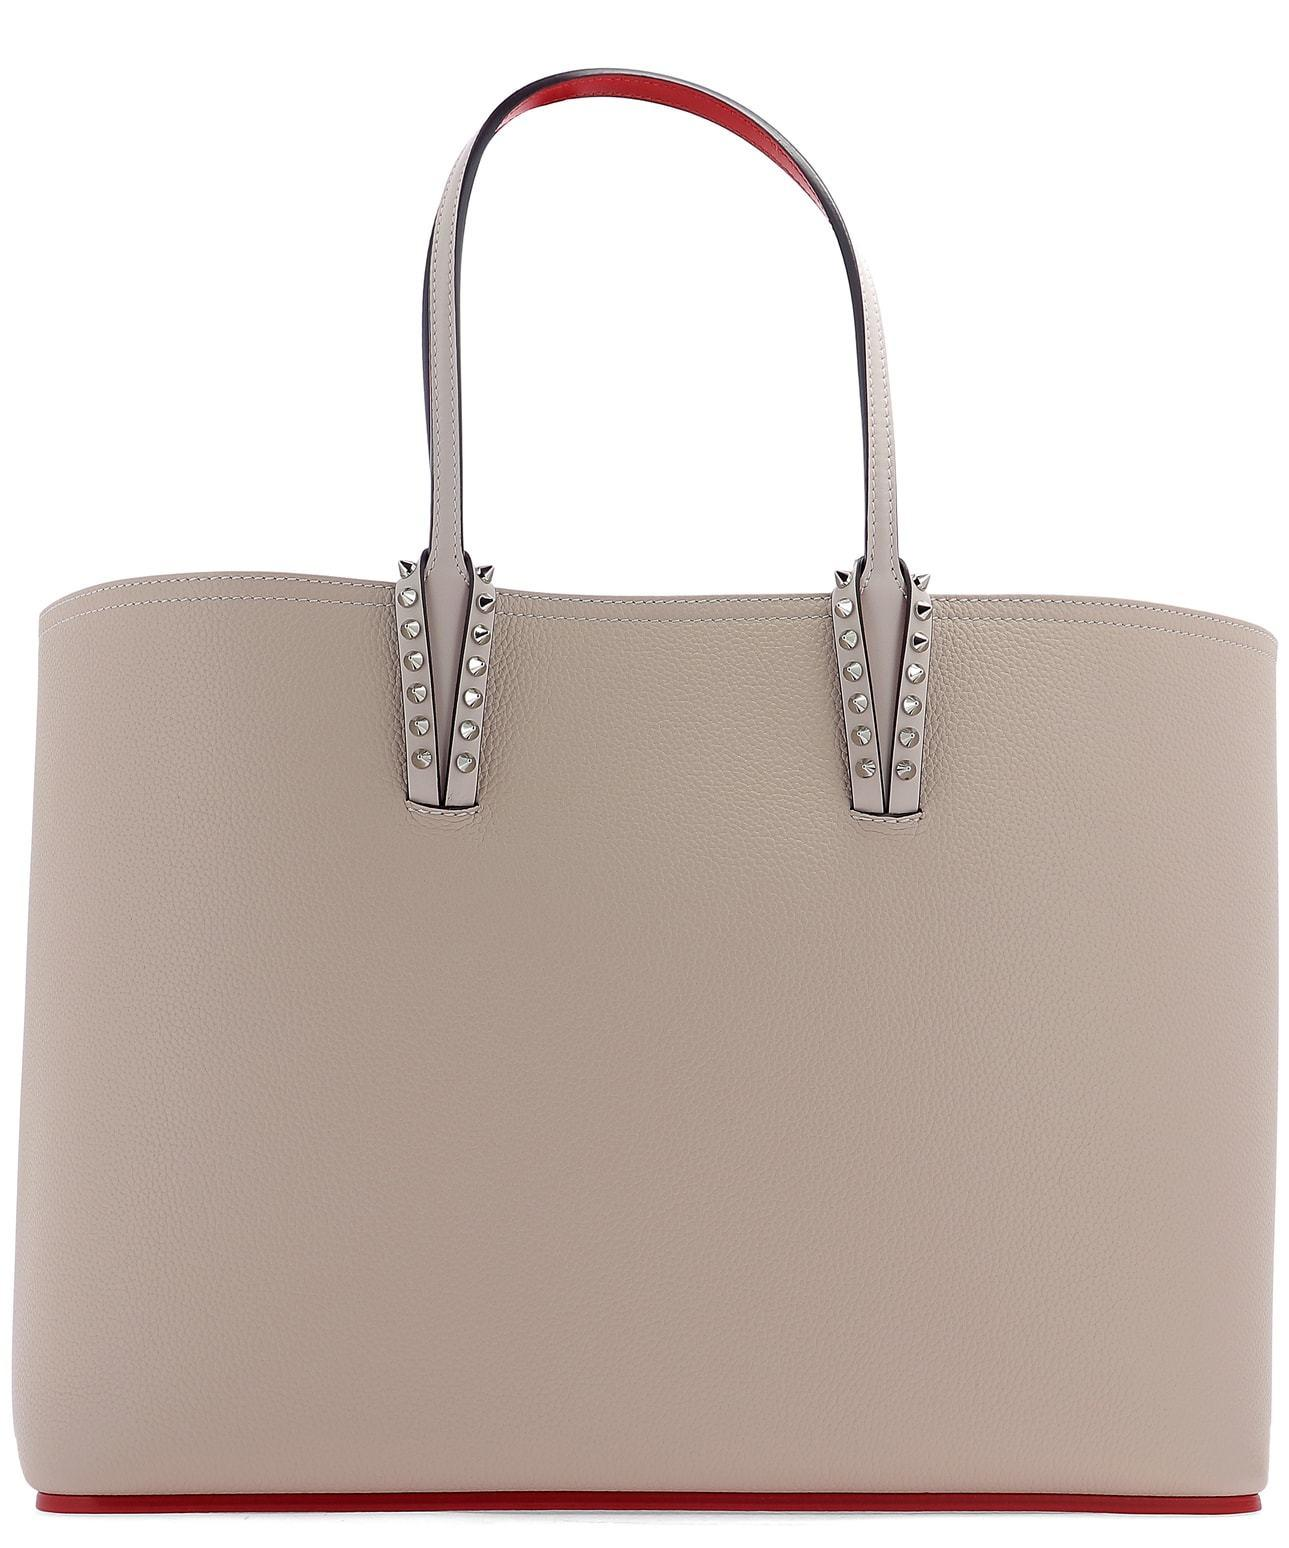 41a3c2e0de8b Lyst - Christian Louboutin Cabata Tote Bag in Natural